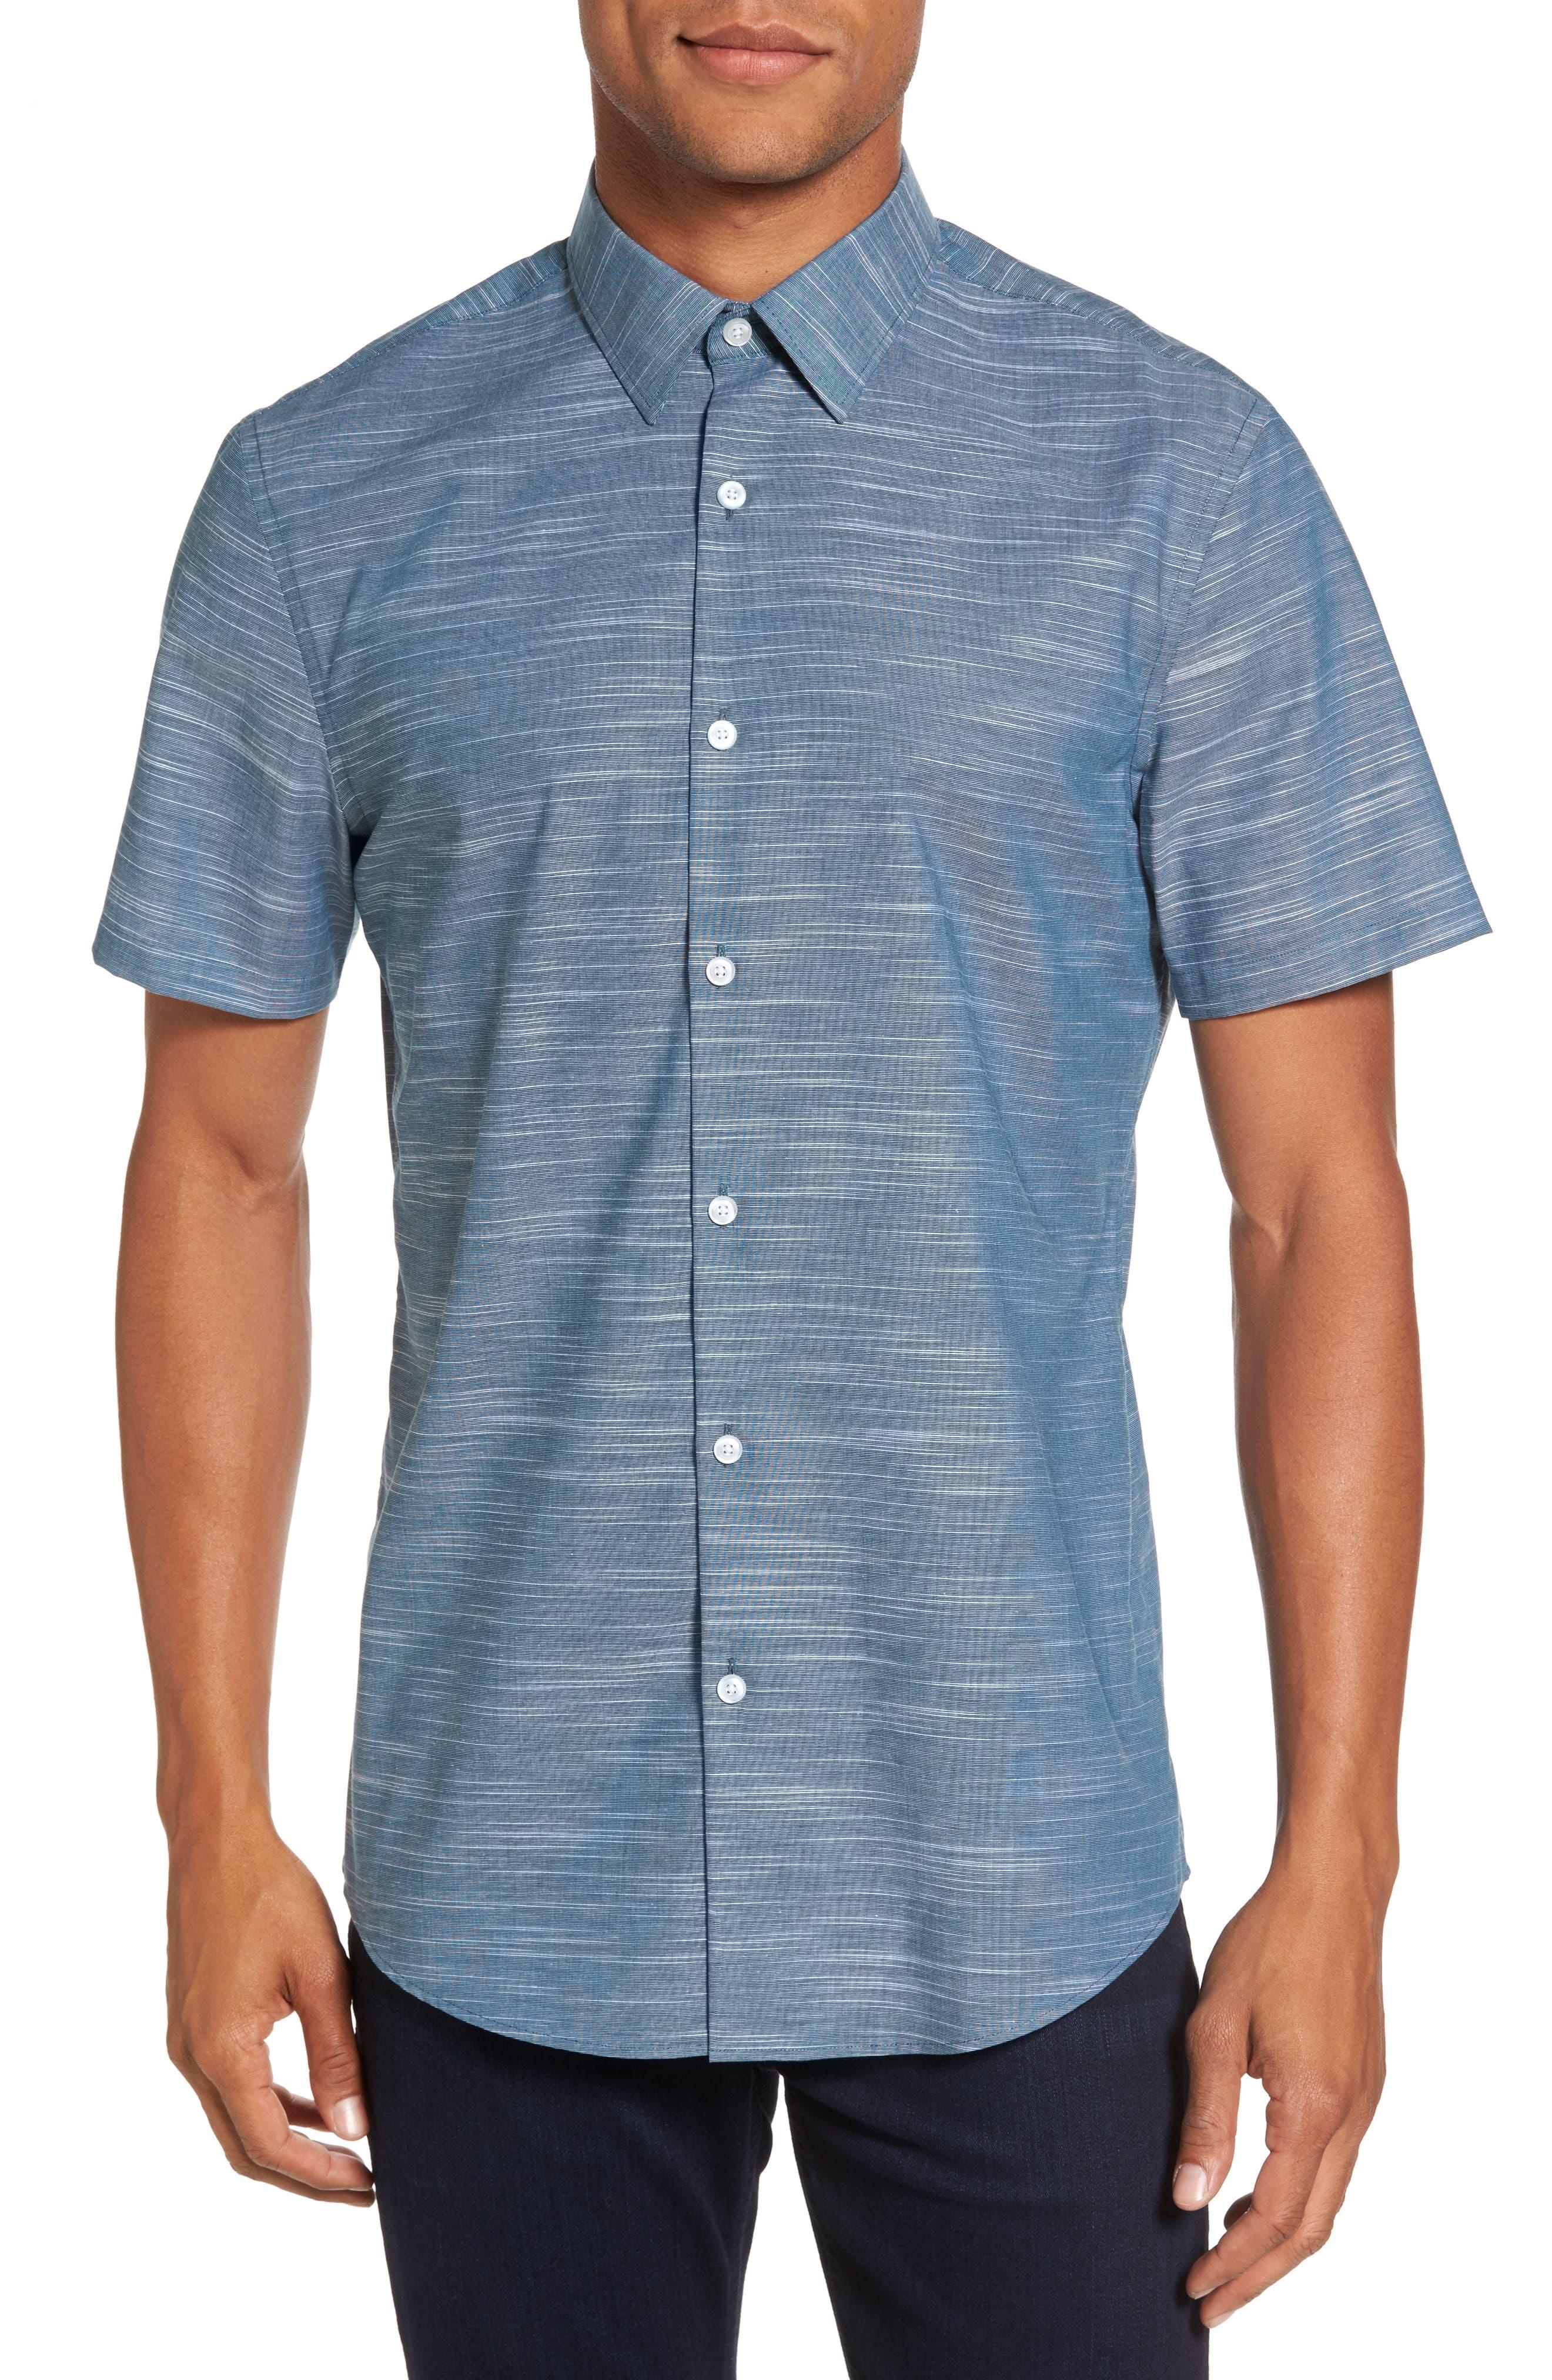 Calilbrate Slim Fit Slub Woven Shirt,                             Main thumbnail 1, color,